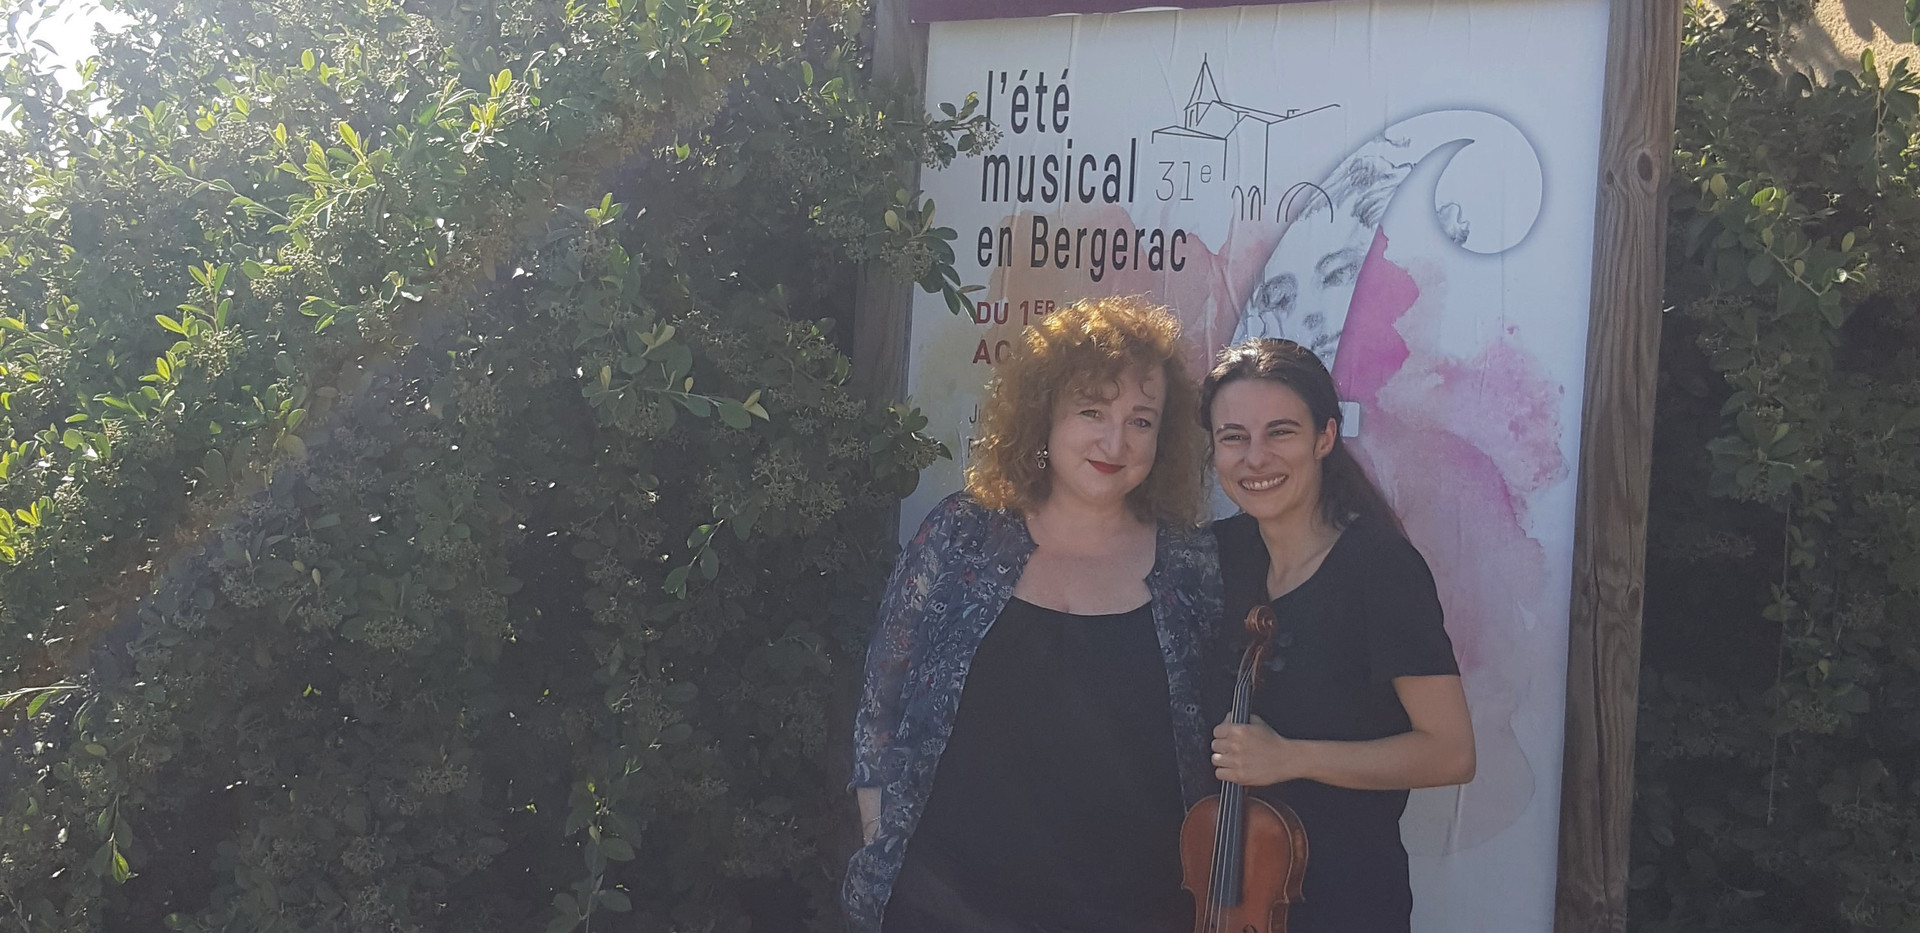 Louise Chisson Tamara Atschba Festival l'Eté musical en Bergerac Esperus Academy